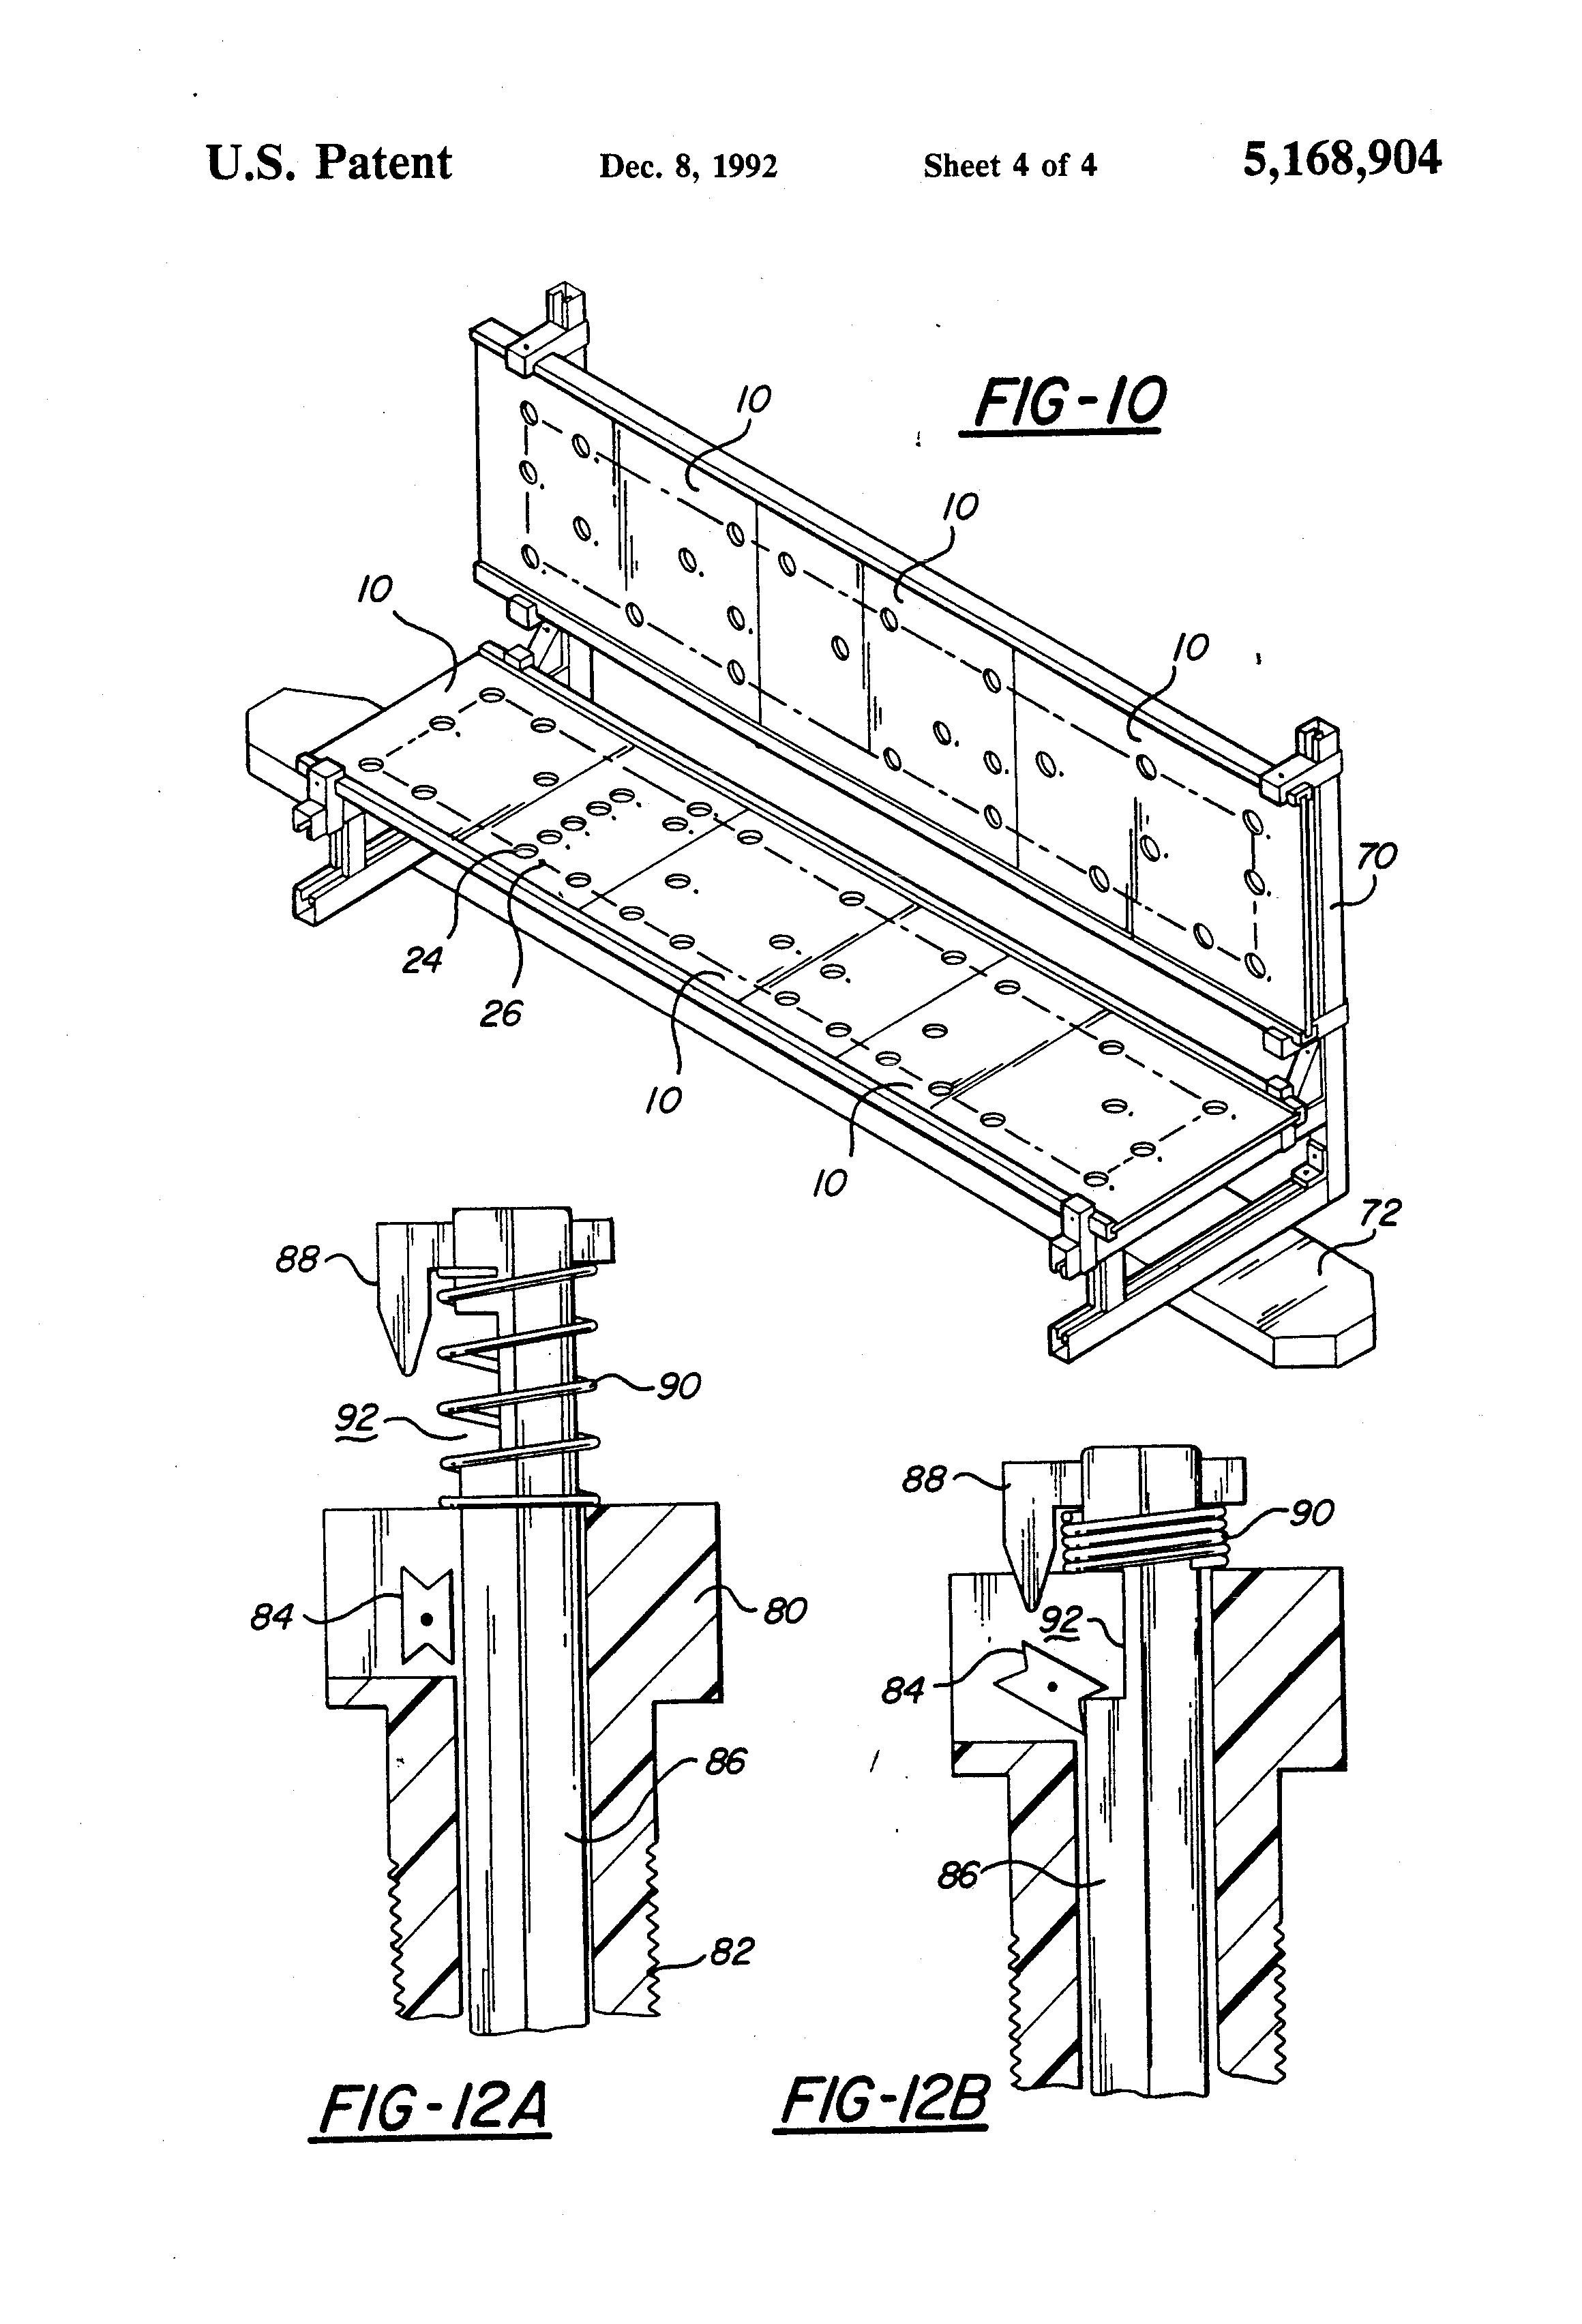 wire harness board fixture